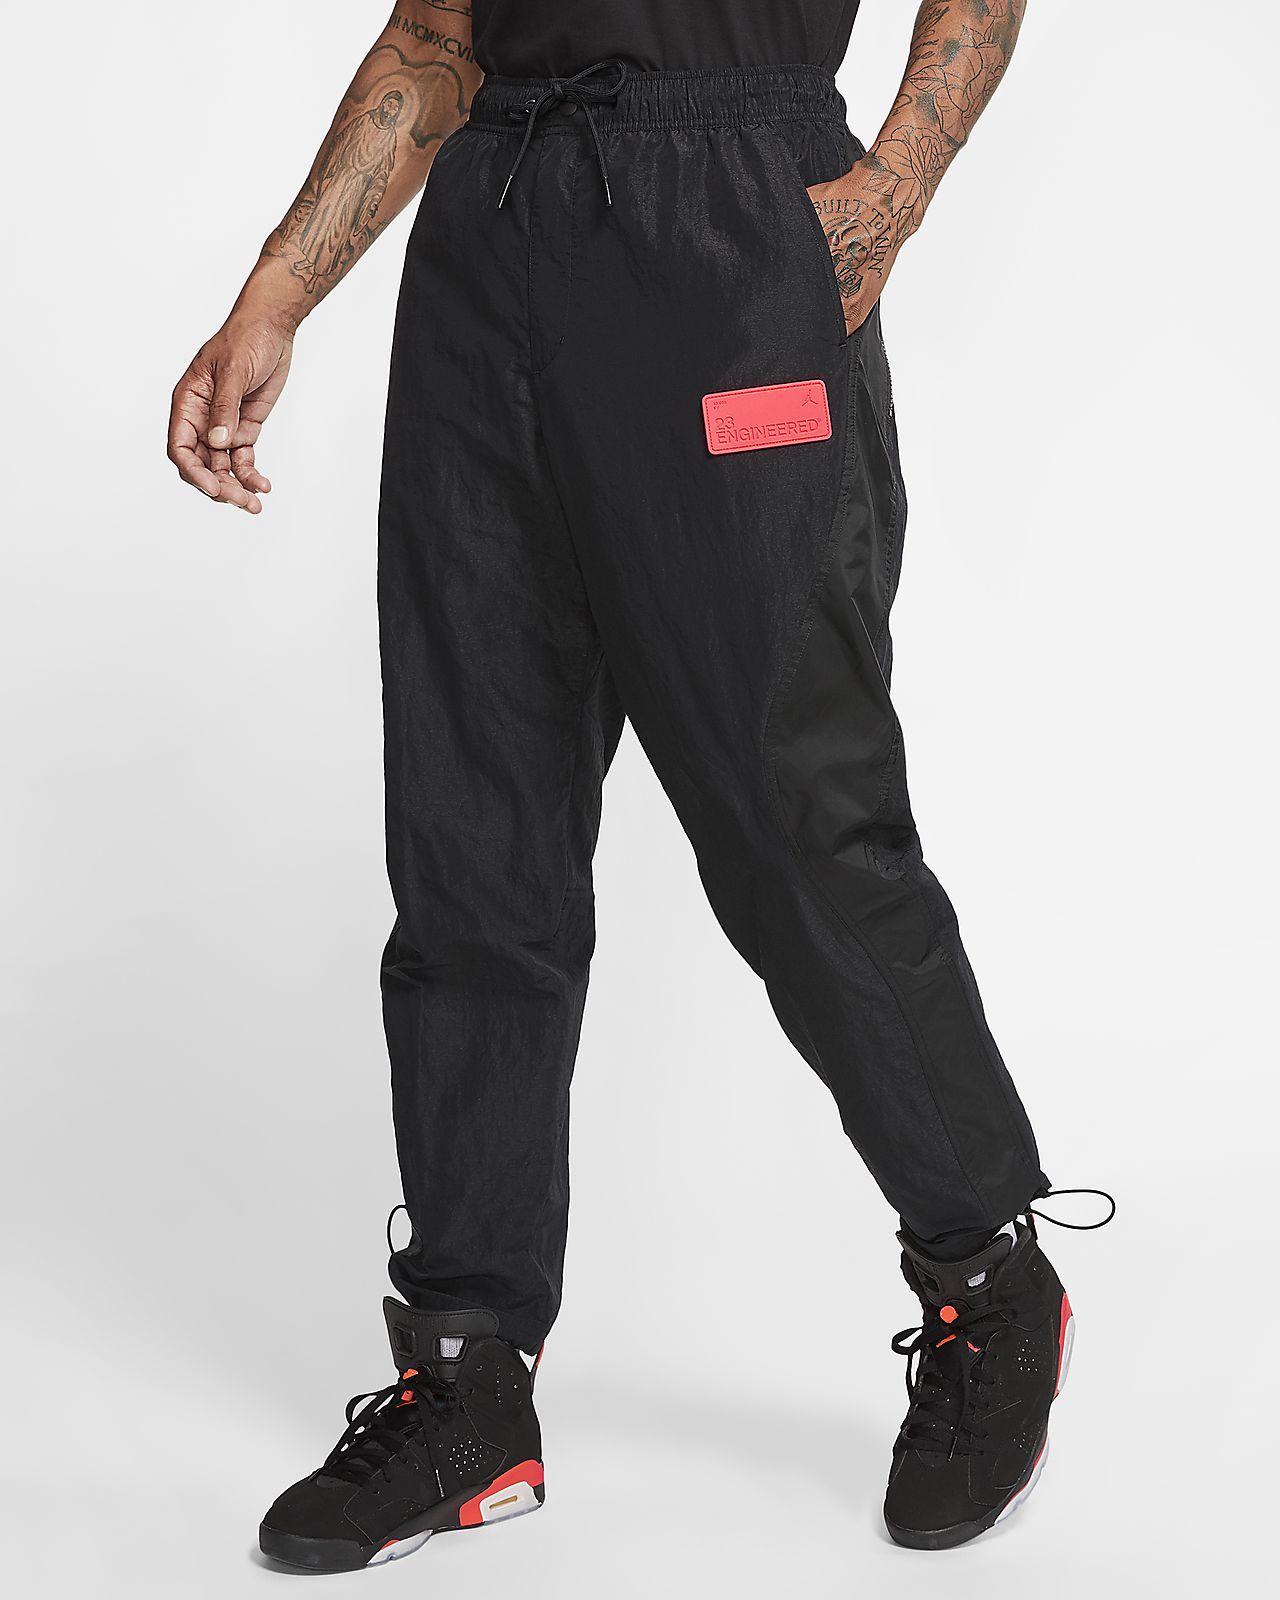 Jordan 23 Engineered Men's Nylon Pants